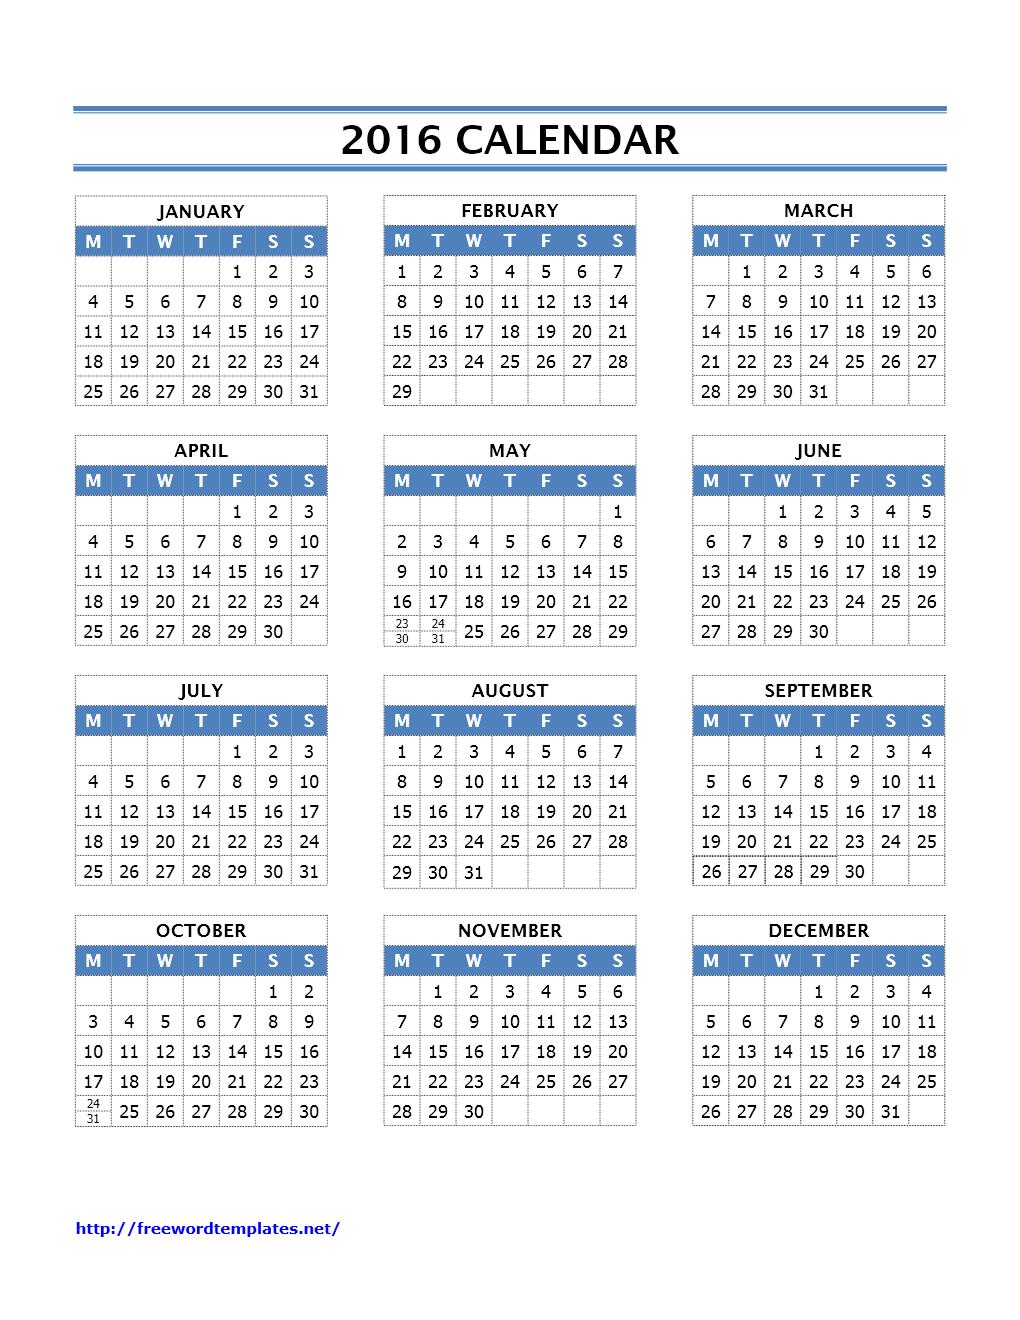 2016 Calendar Templates | Word Templates | Free Word ...